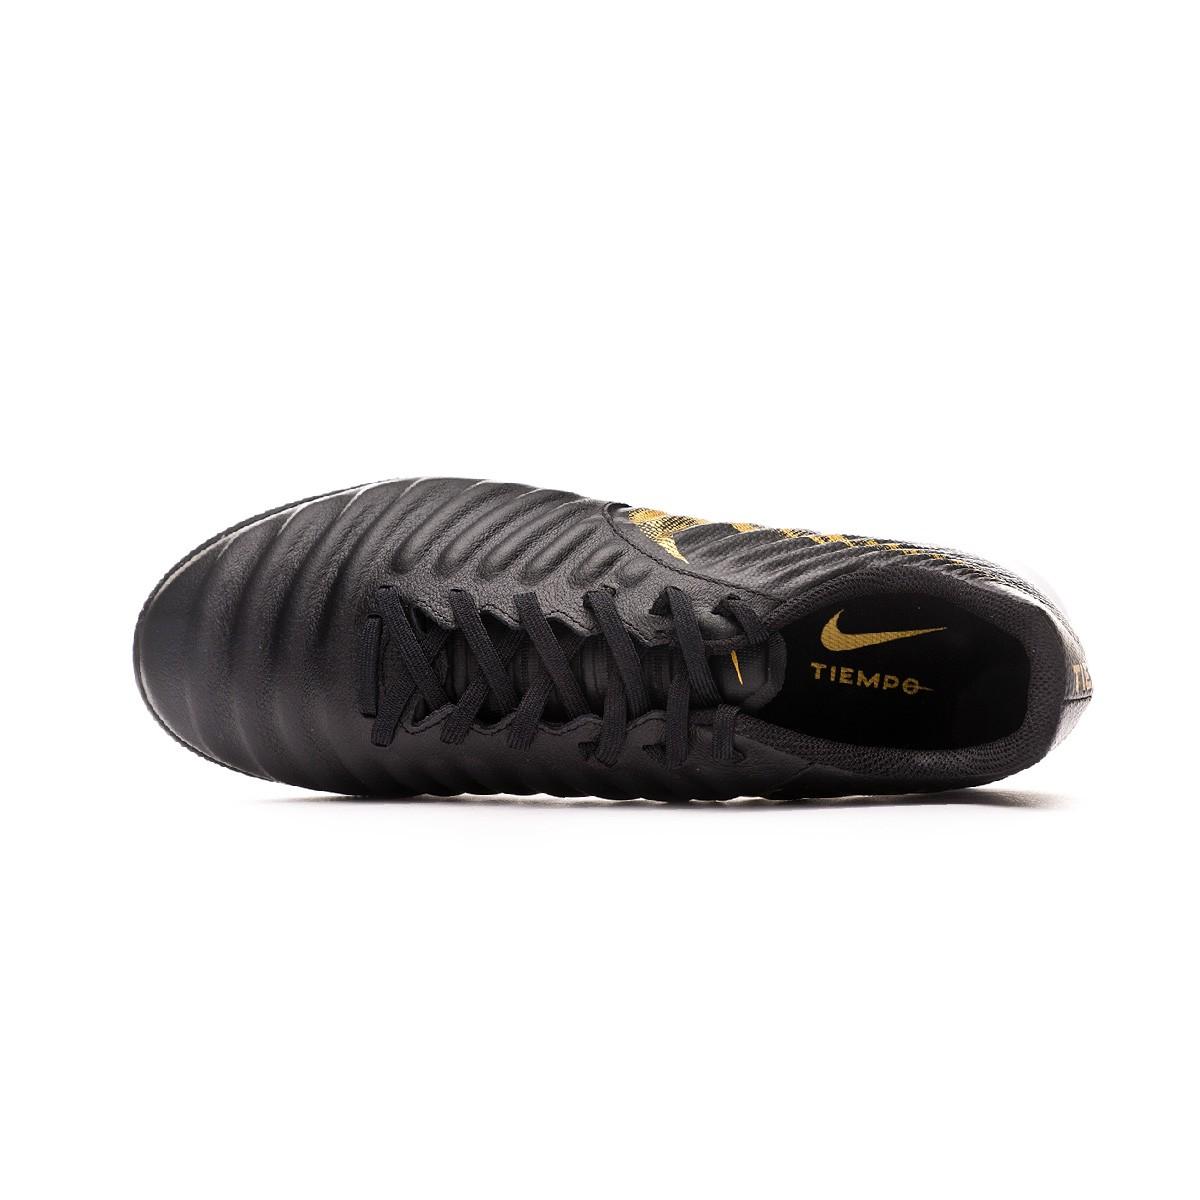 0e39432c2 Football Boot Nike Tiempo LegendX VII Pro Turf Black-Metallic vivid gold -  Football store Fútbol Emotion